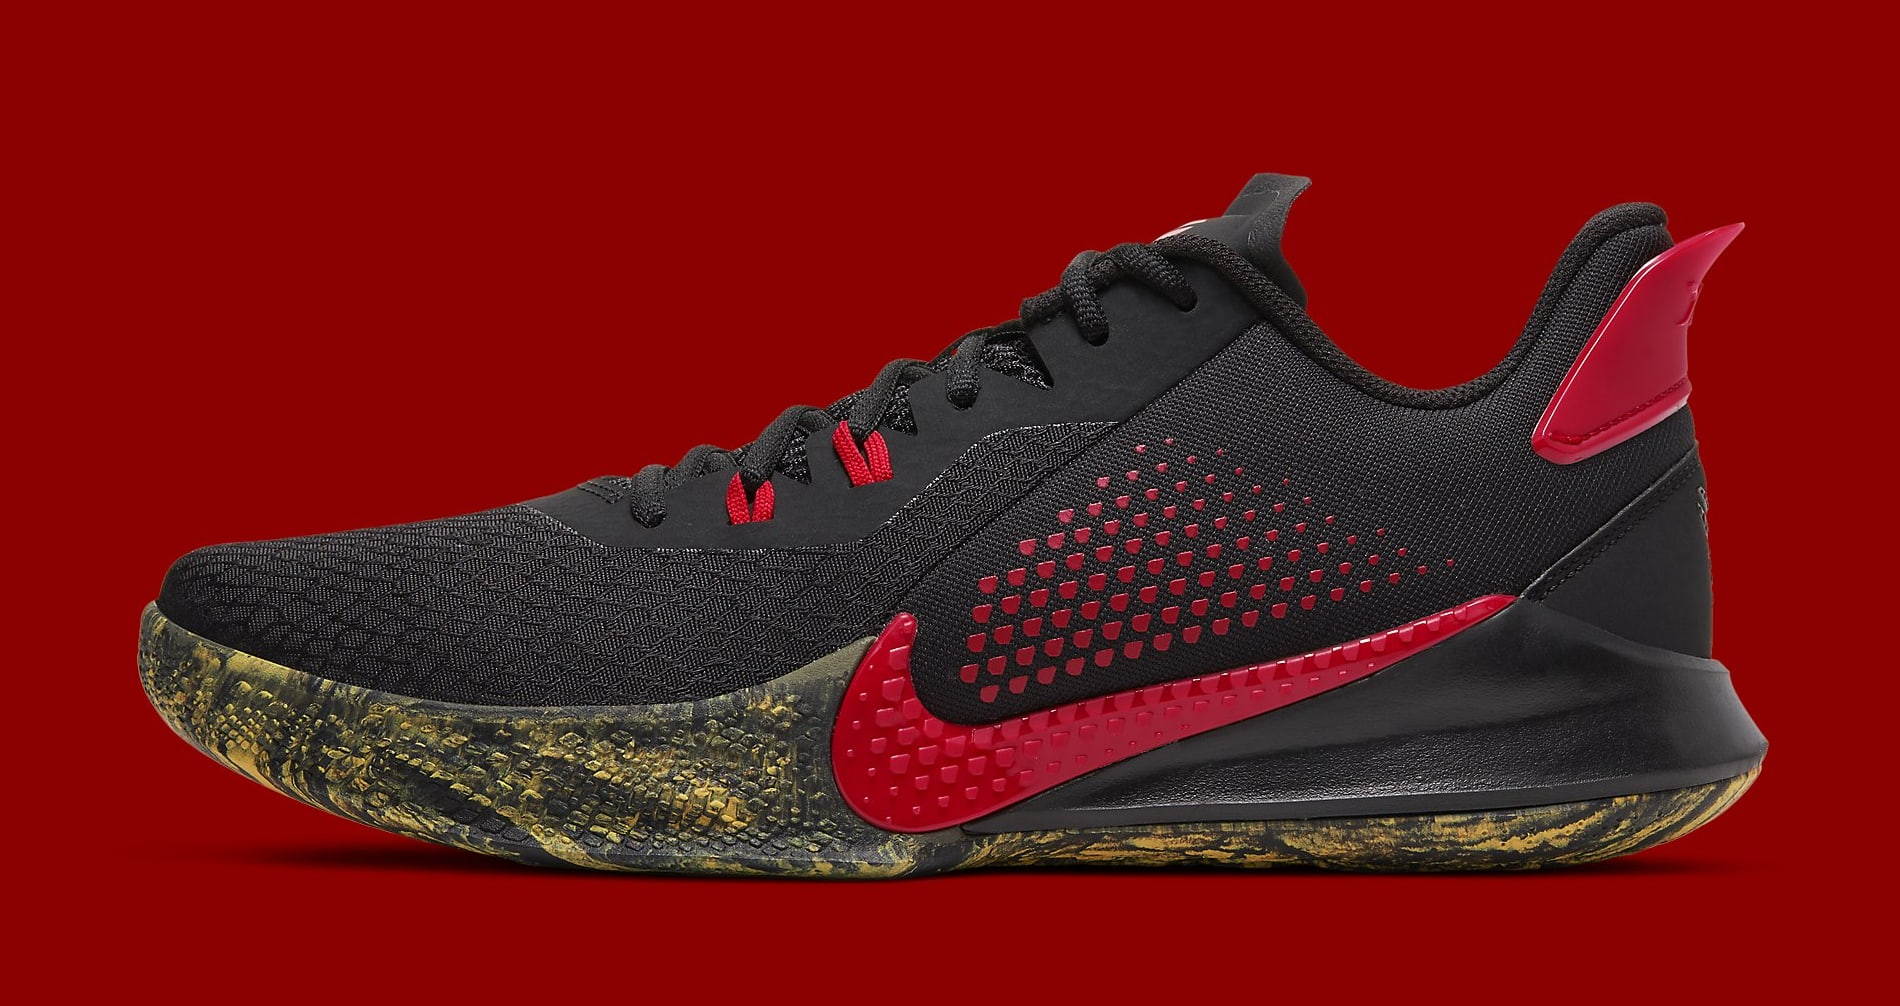 Nike Kobe Mamba Fury CK2087-002 Lateral